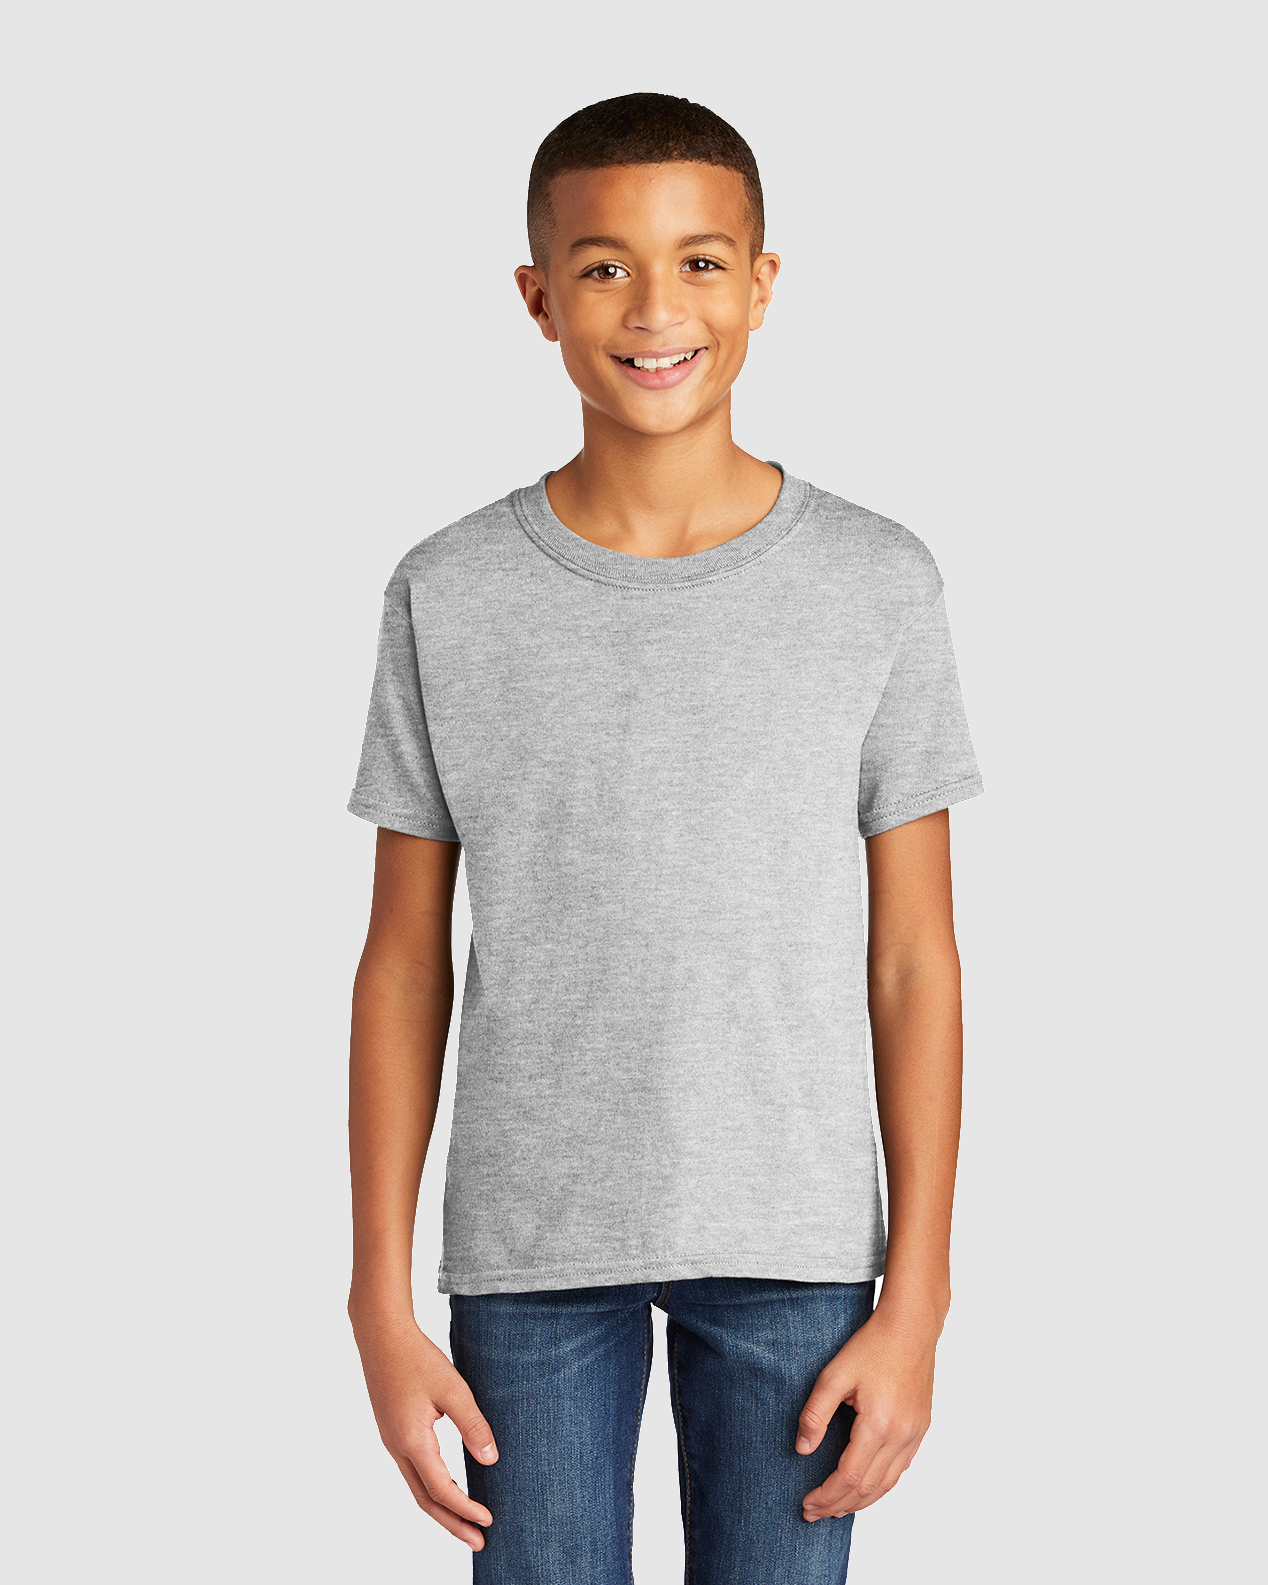 Ringspun T Shirt >> Gildan Kids Softstyle Ringspun T Shirt